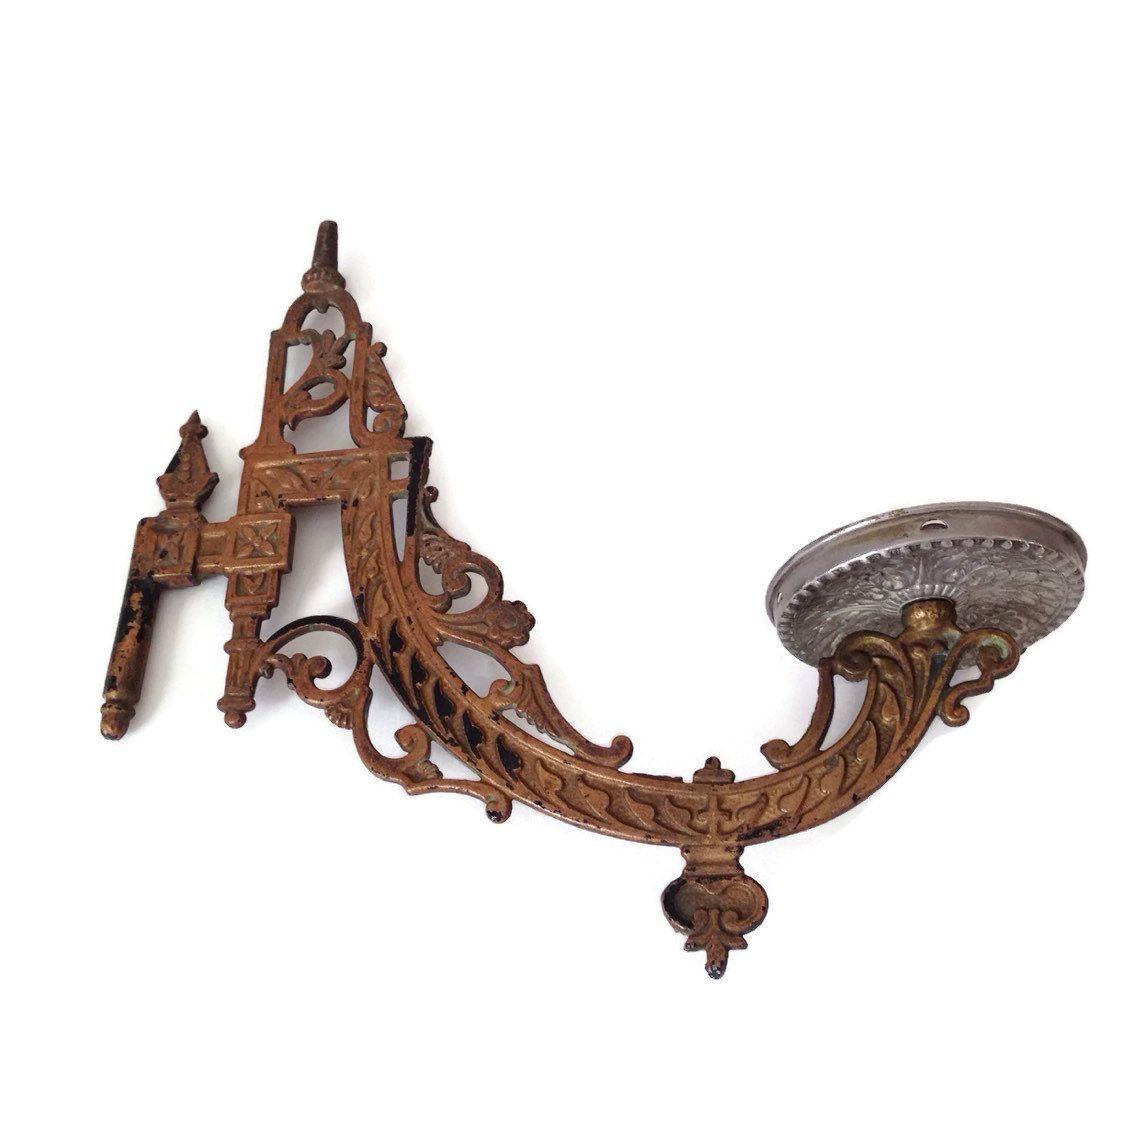 Antique Oil Lamp Holder Cast Iron Victorian Wall Mount Wall Etsy Antique Oil Lamps Candle Wall Sconces Oil Lamps